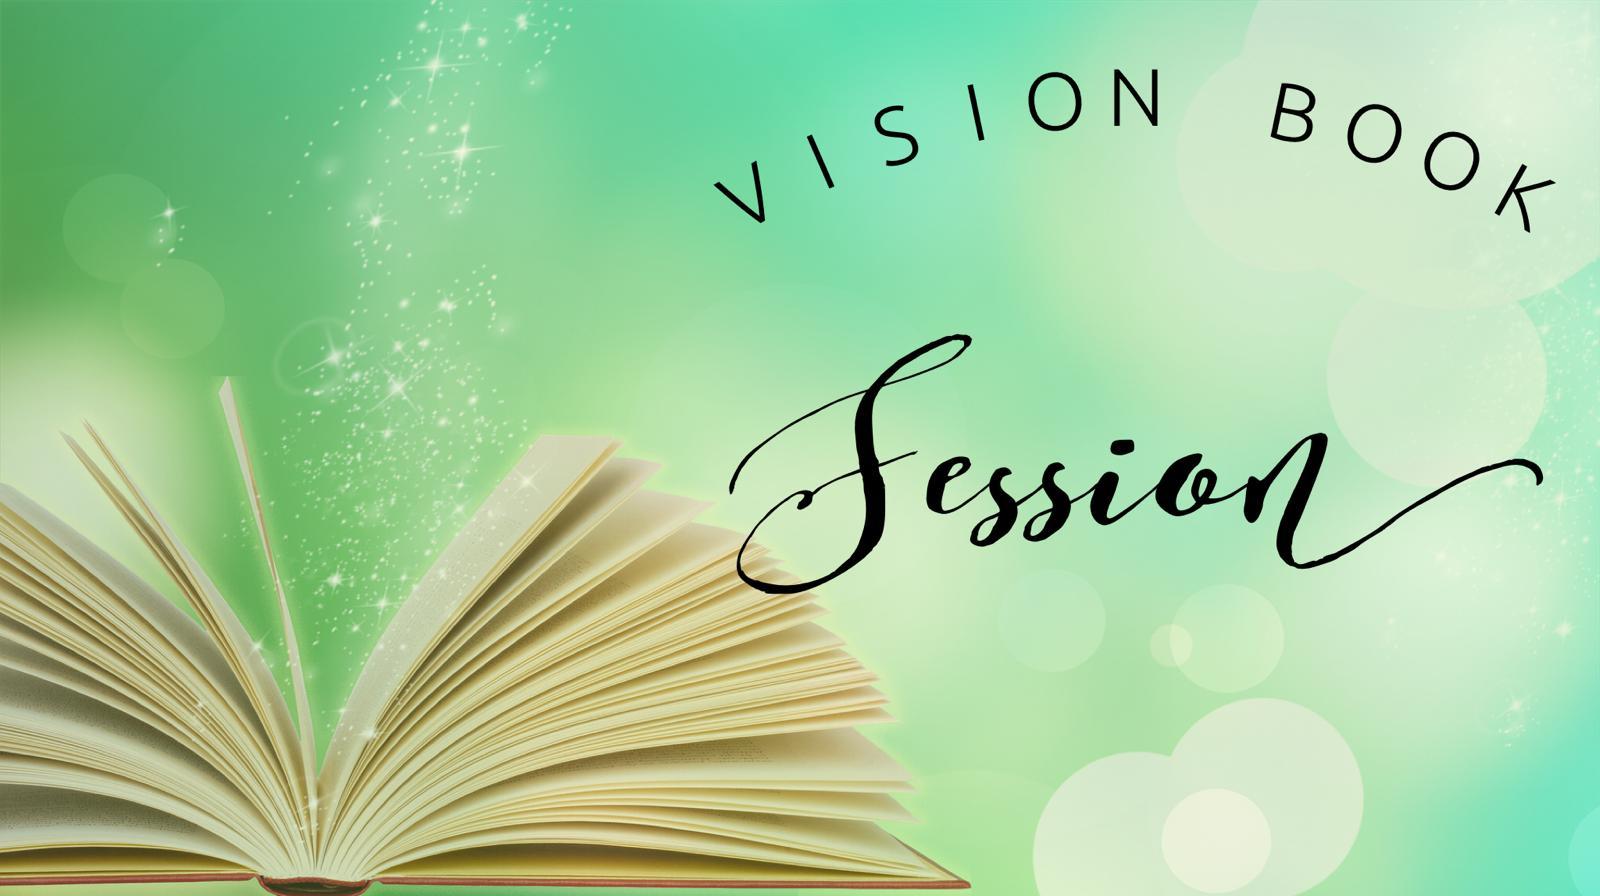 visionbooksession.jpeg